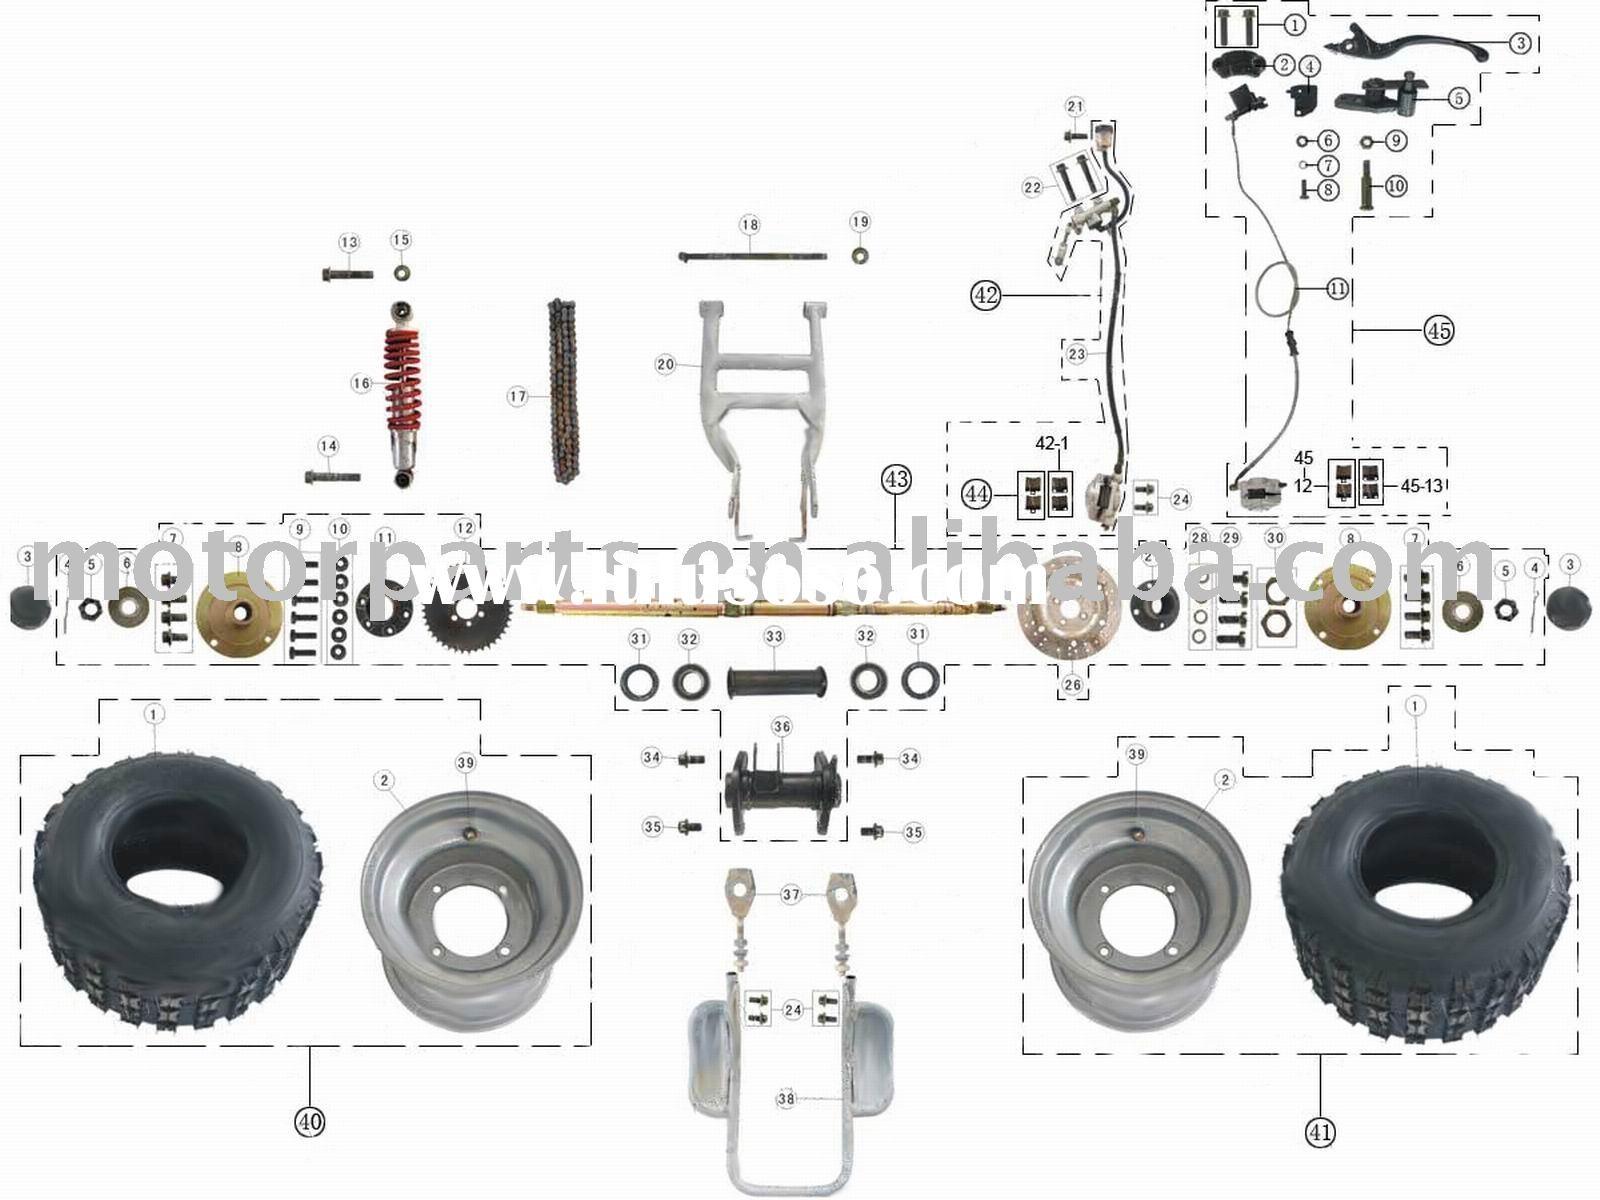 hight resolution of razor e300 rear wheel assembly diagram wiring diagram